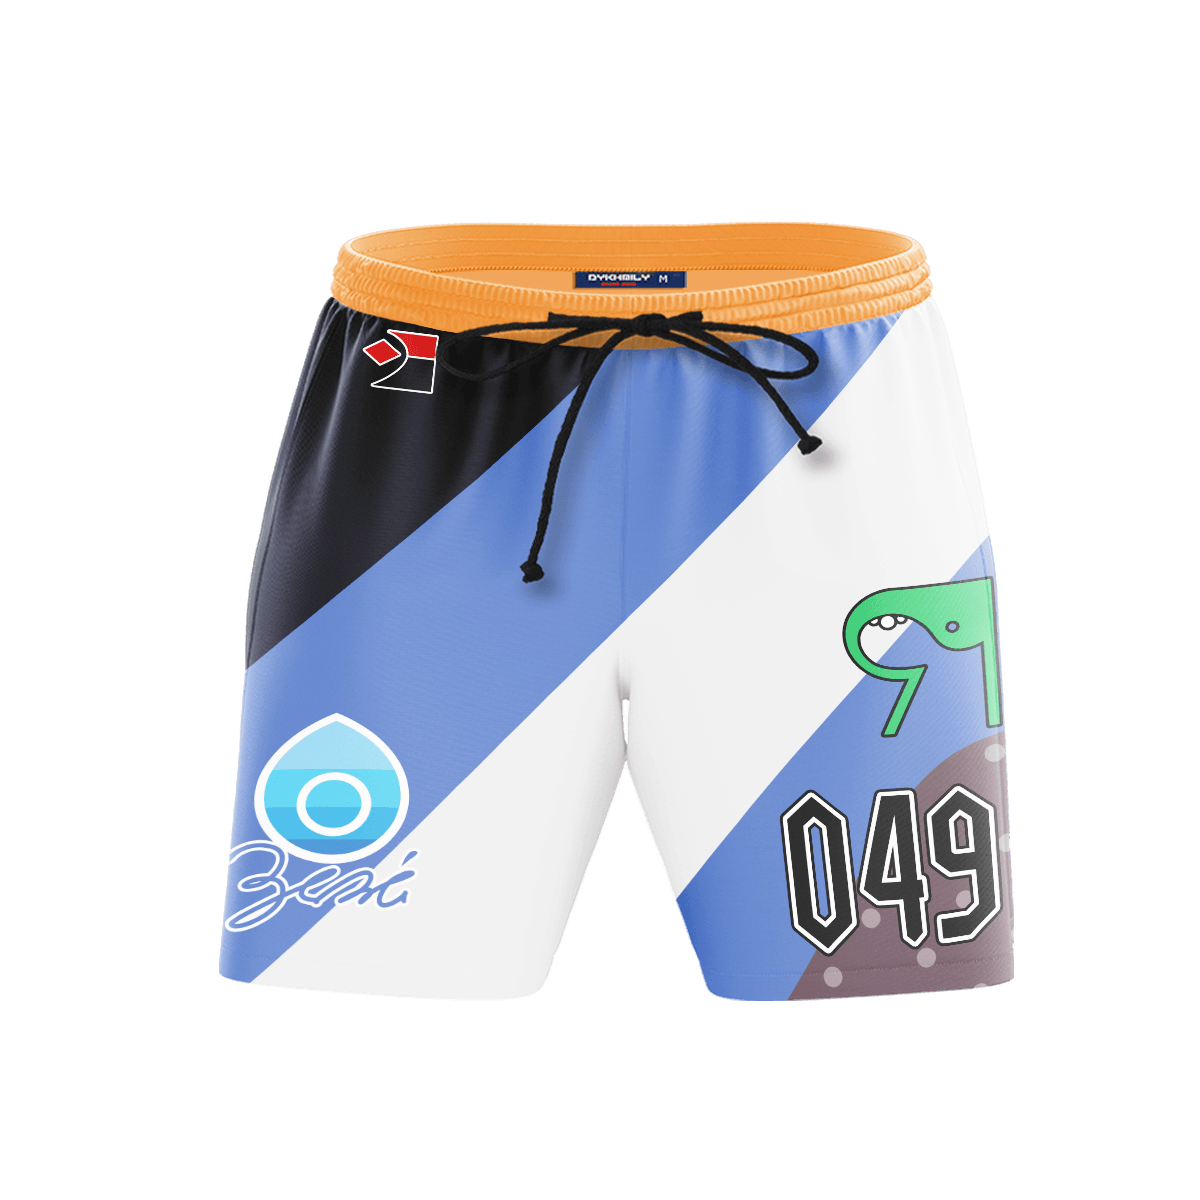 Pokemon Water Uniform Beach Shorts FDM3107 S Official Anime Swimsuit Merch